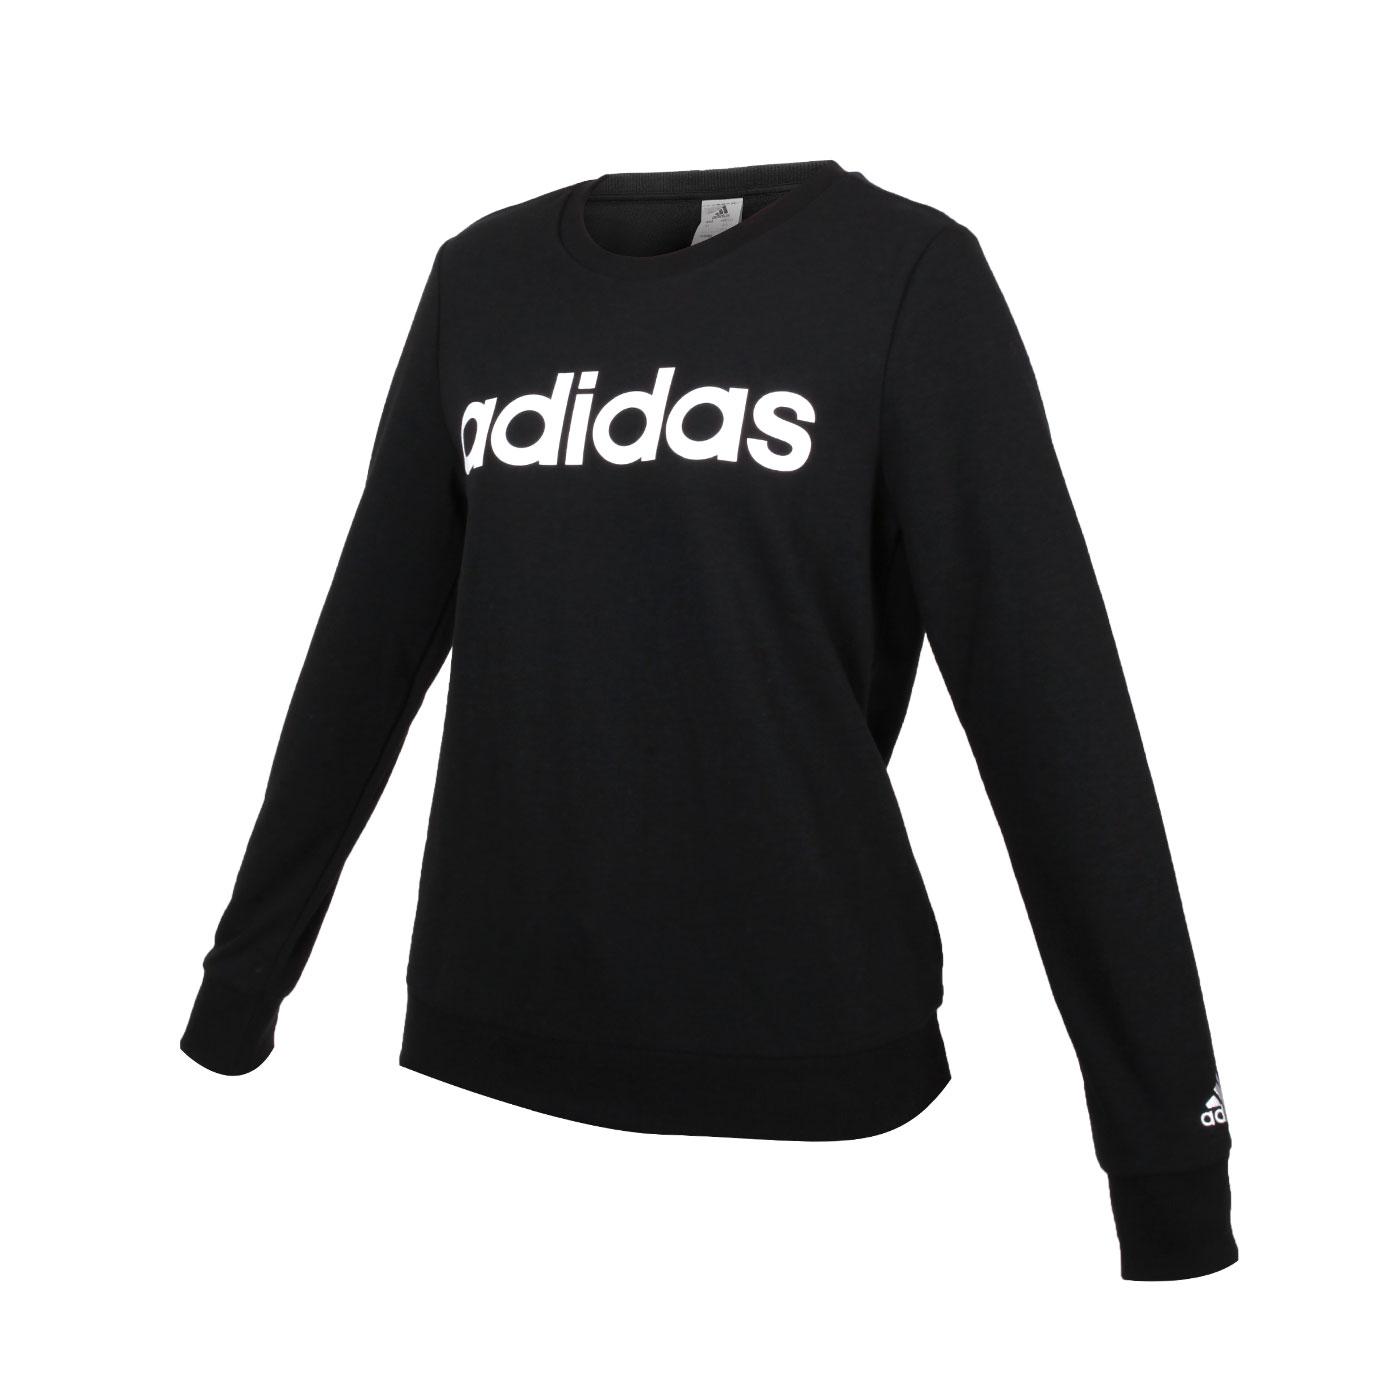 ADIDAS 女款長袖T恤 GL0718 - 黑白